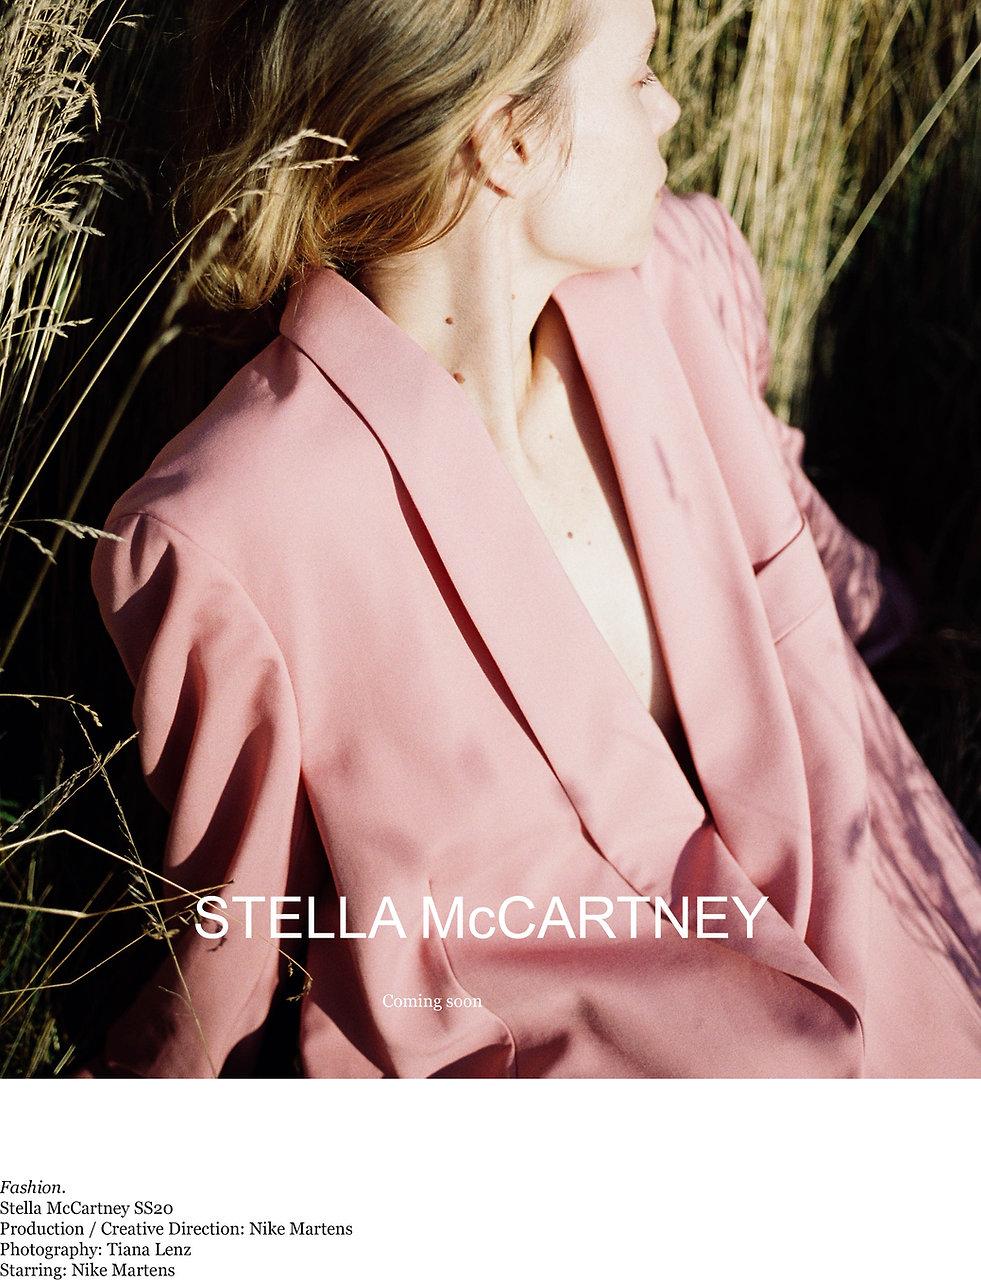 Stella_McCartney_Preview_1.jpg